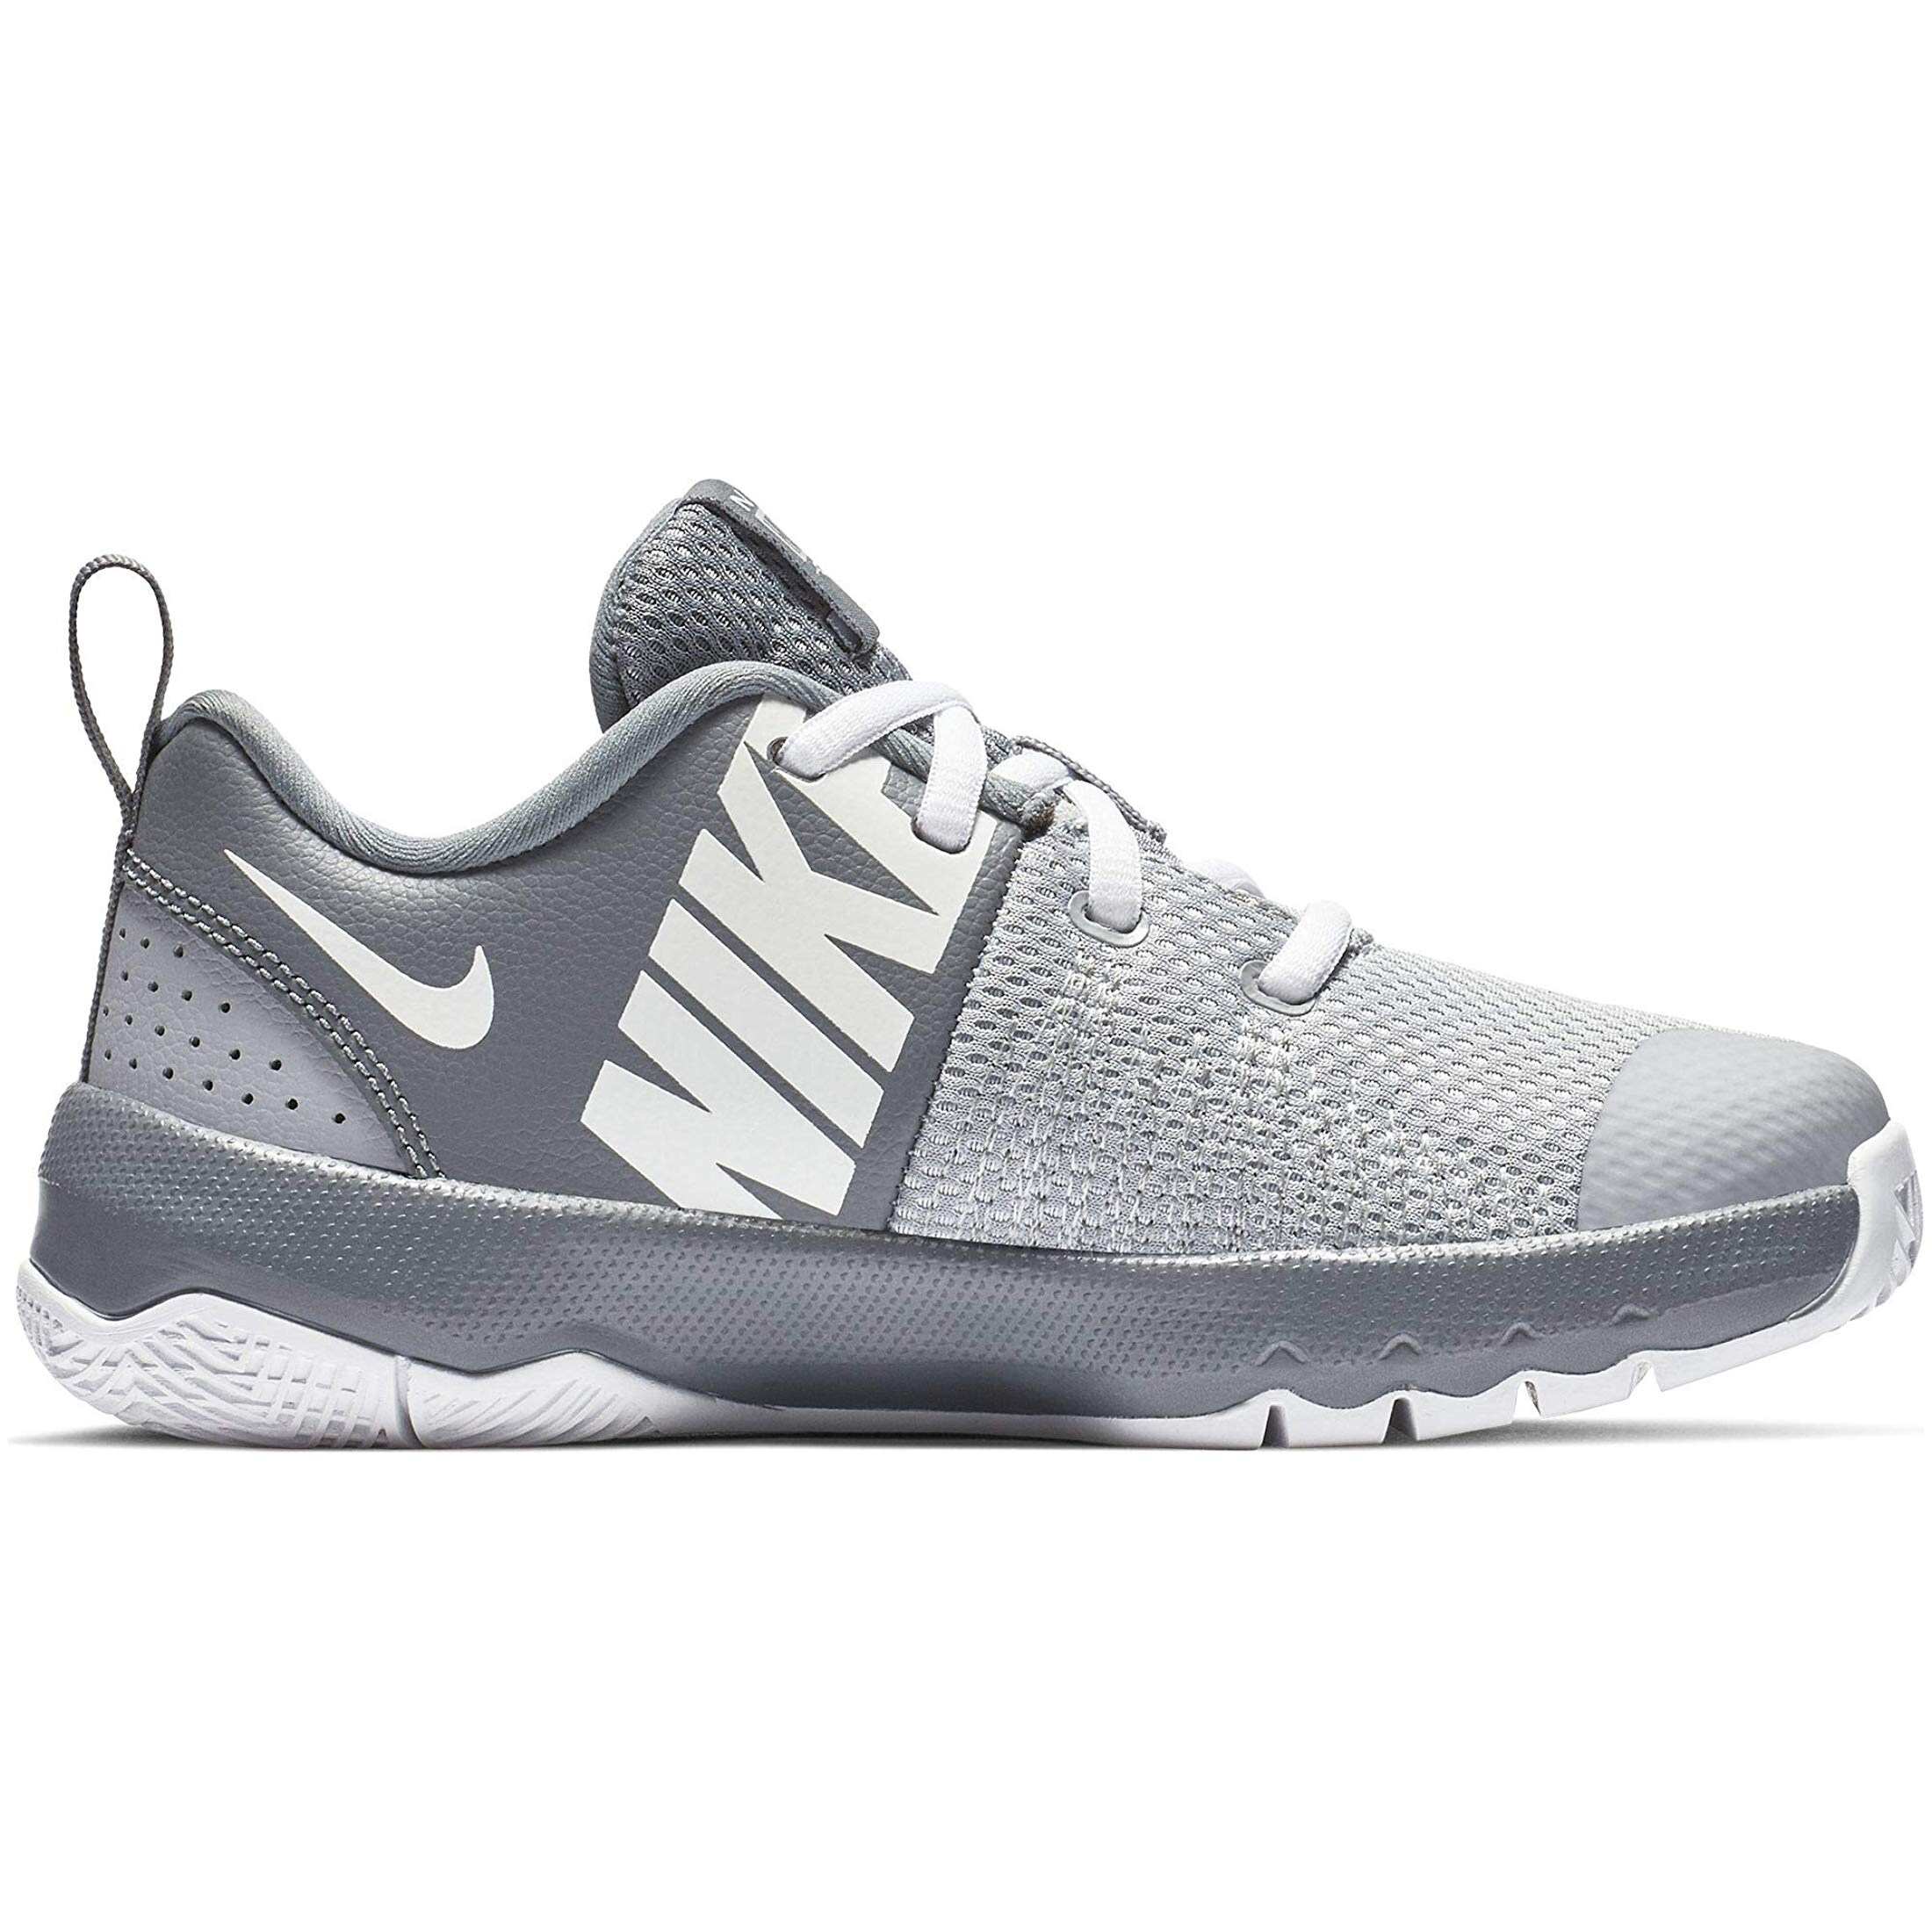 aadb5b73a497 Nike Boys  Shoes